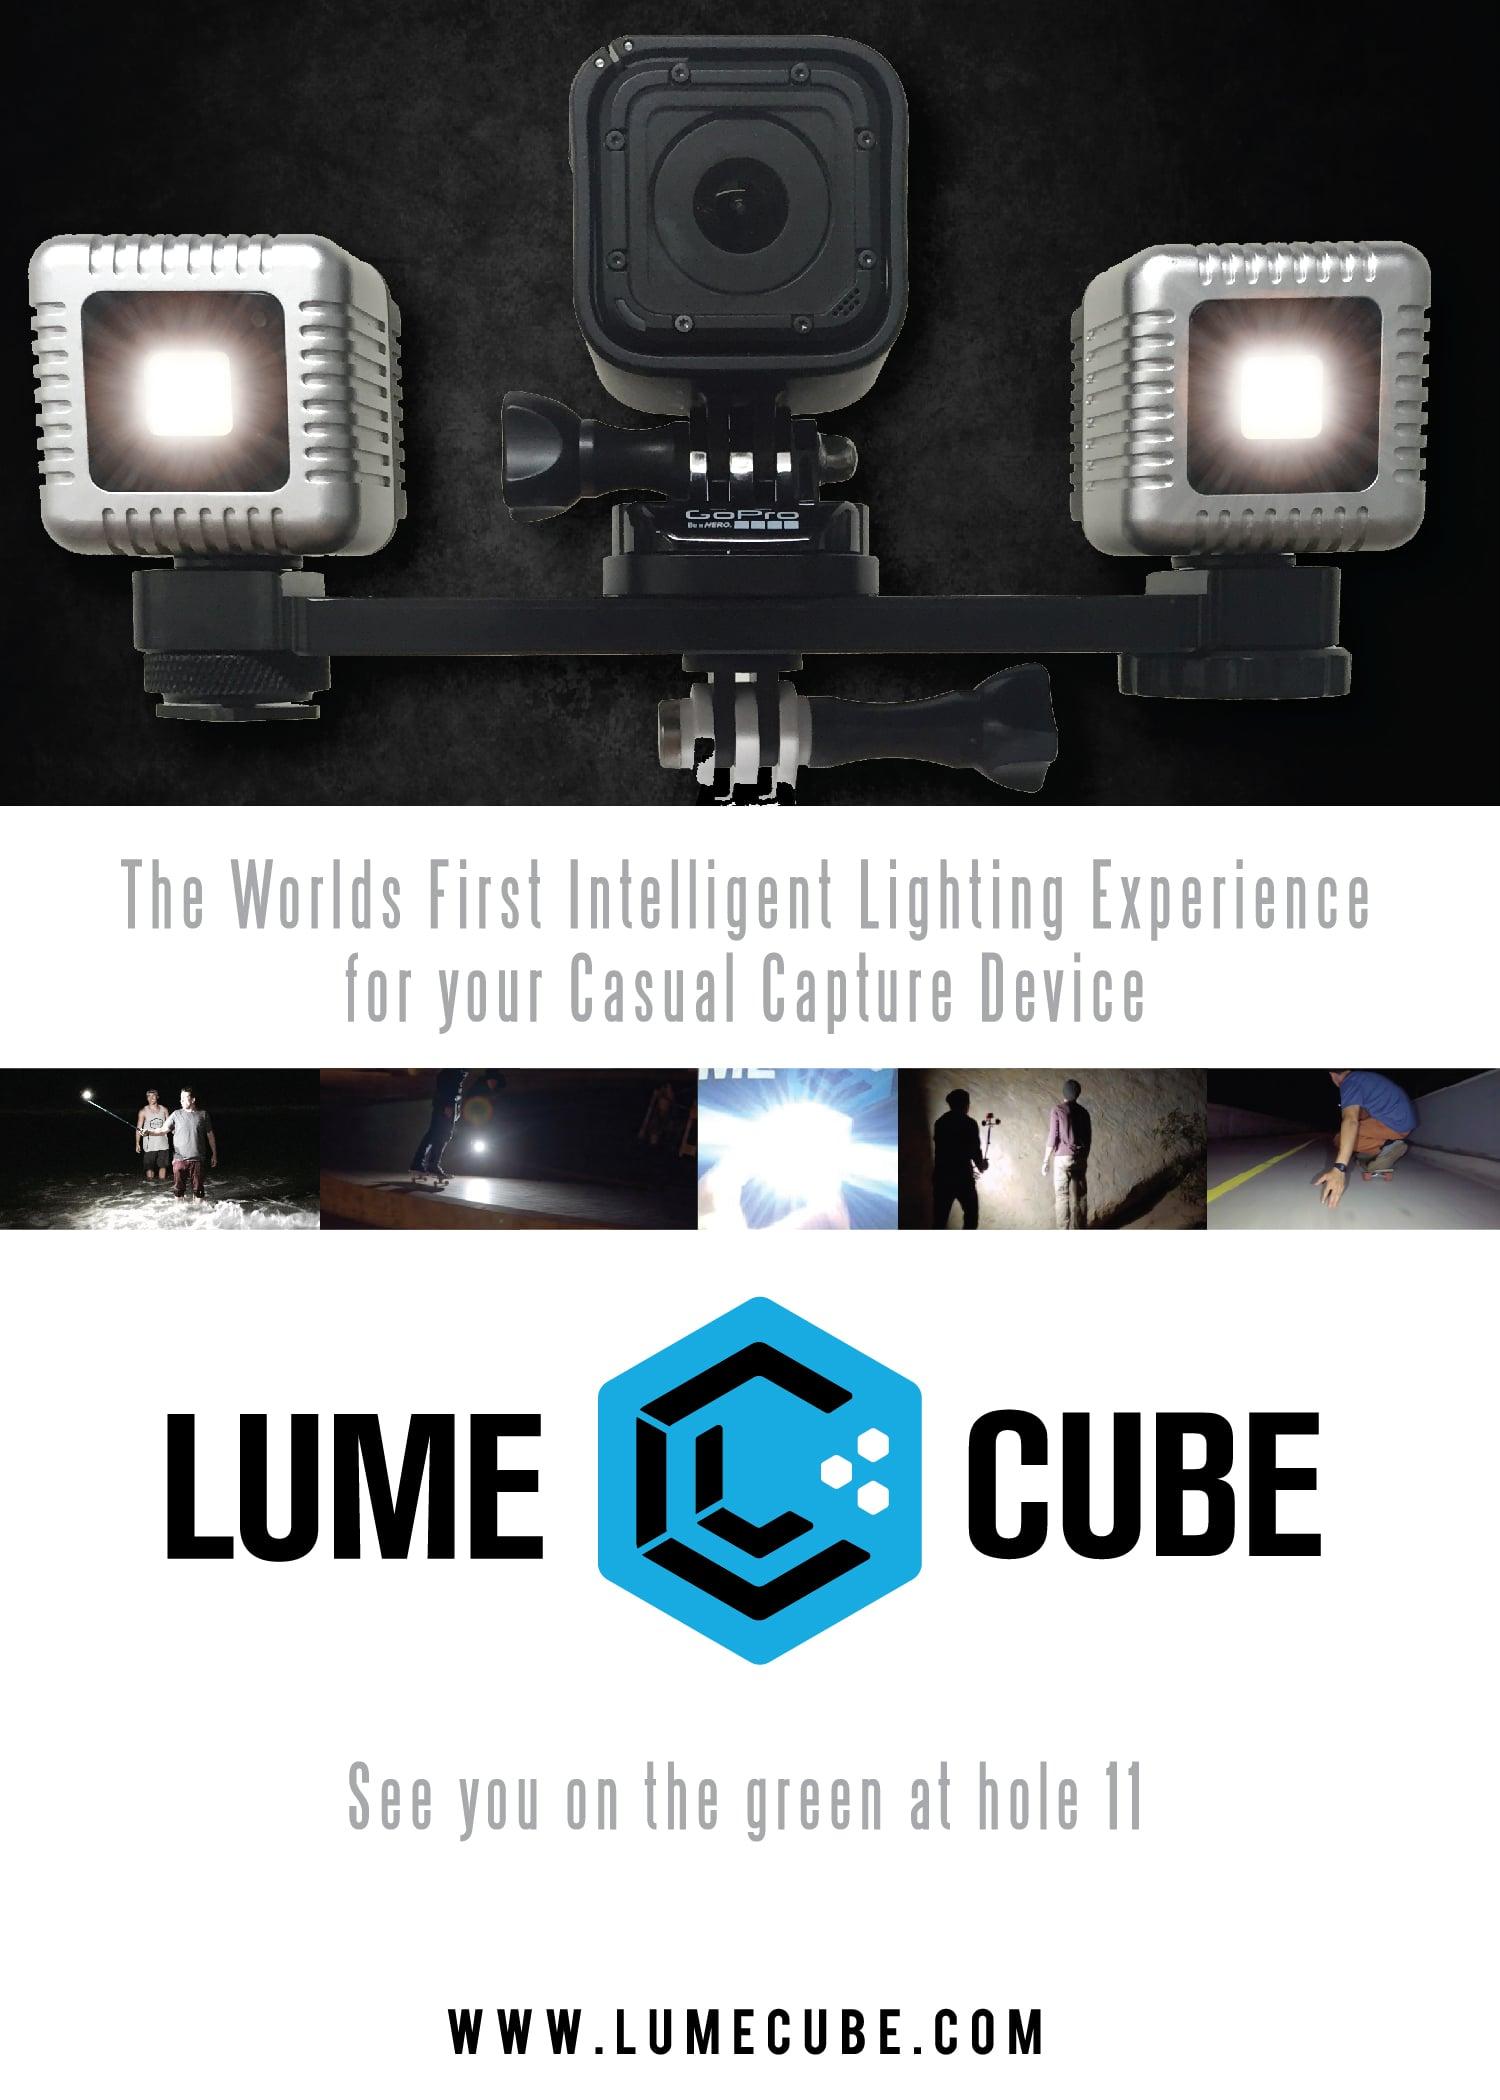 LumeFlyer-01.jpg